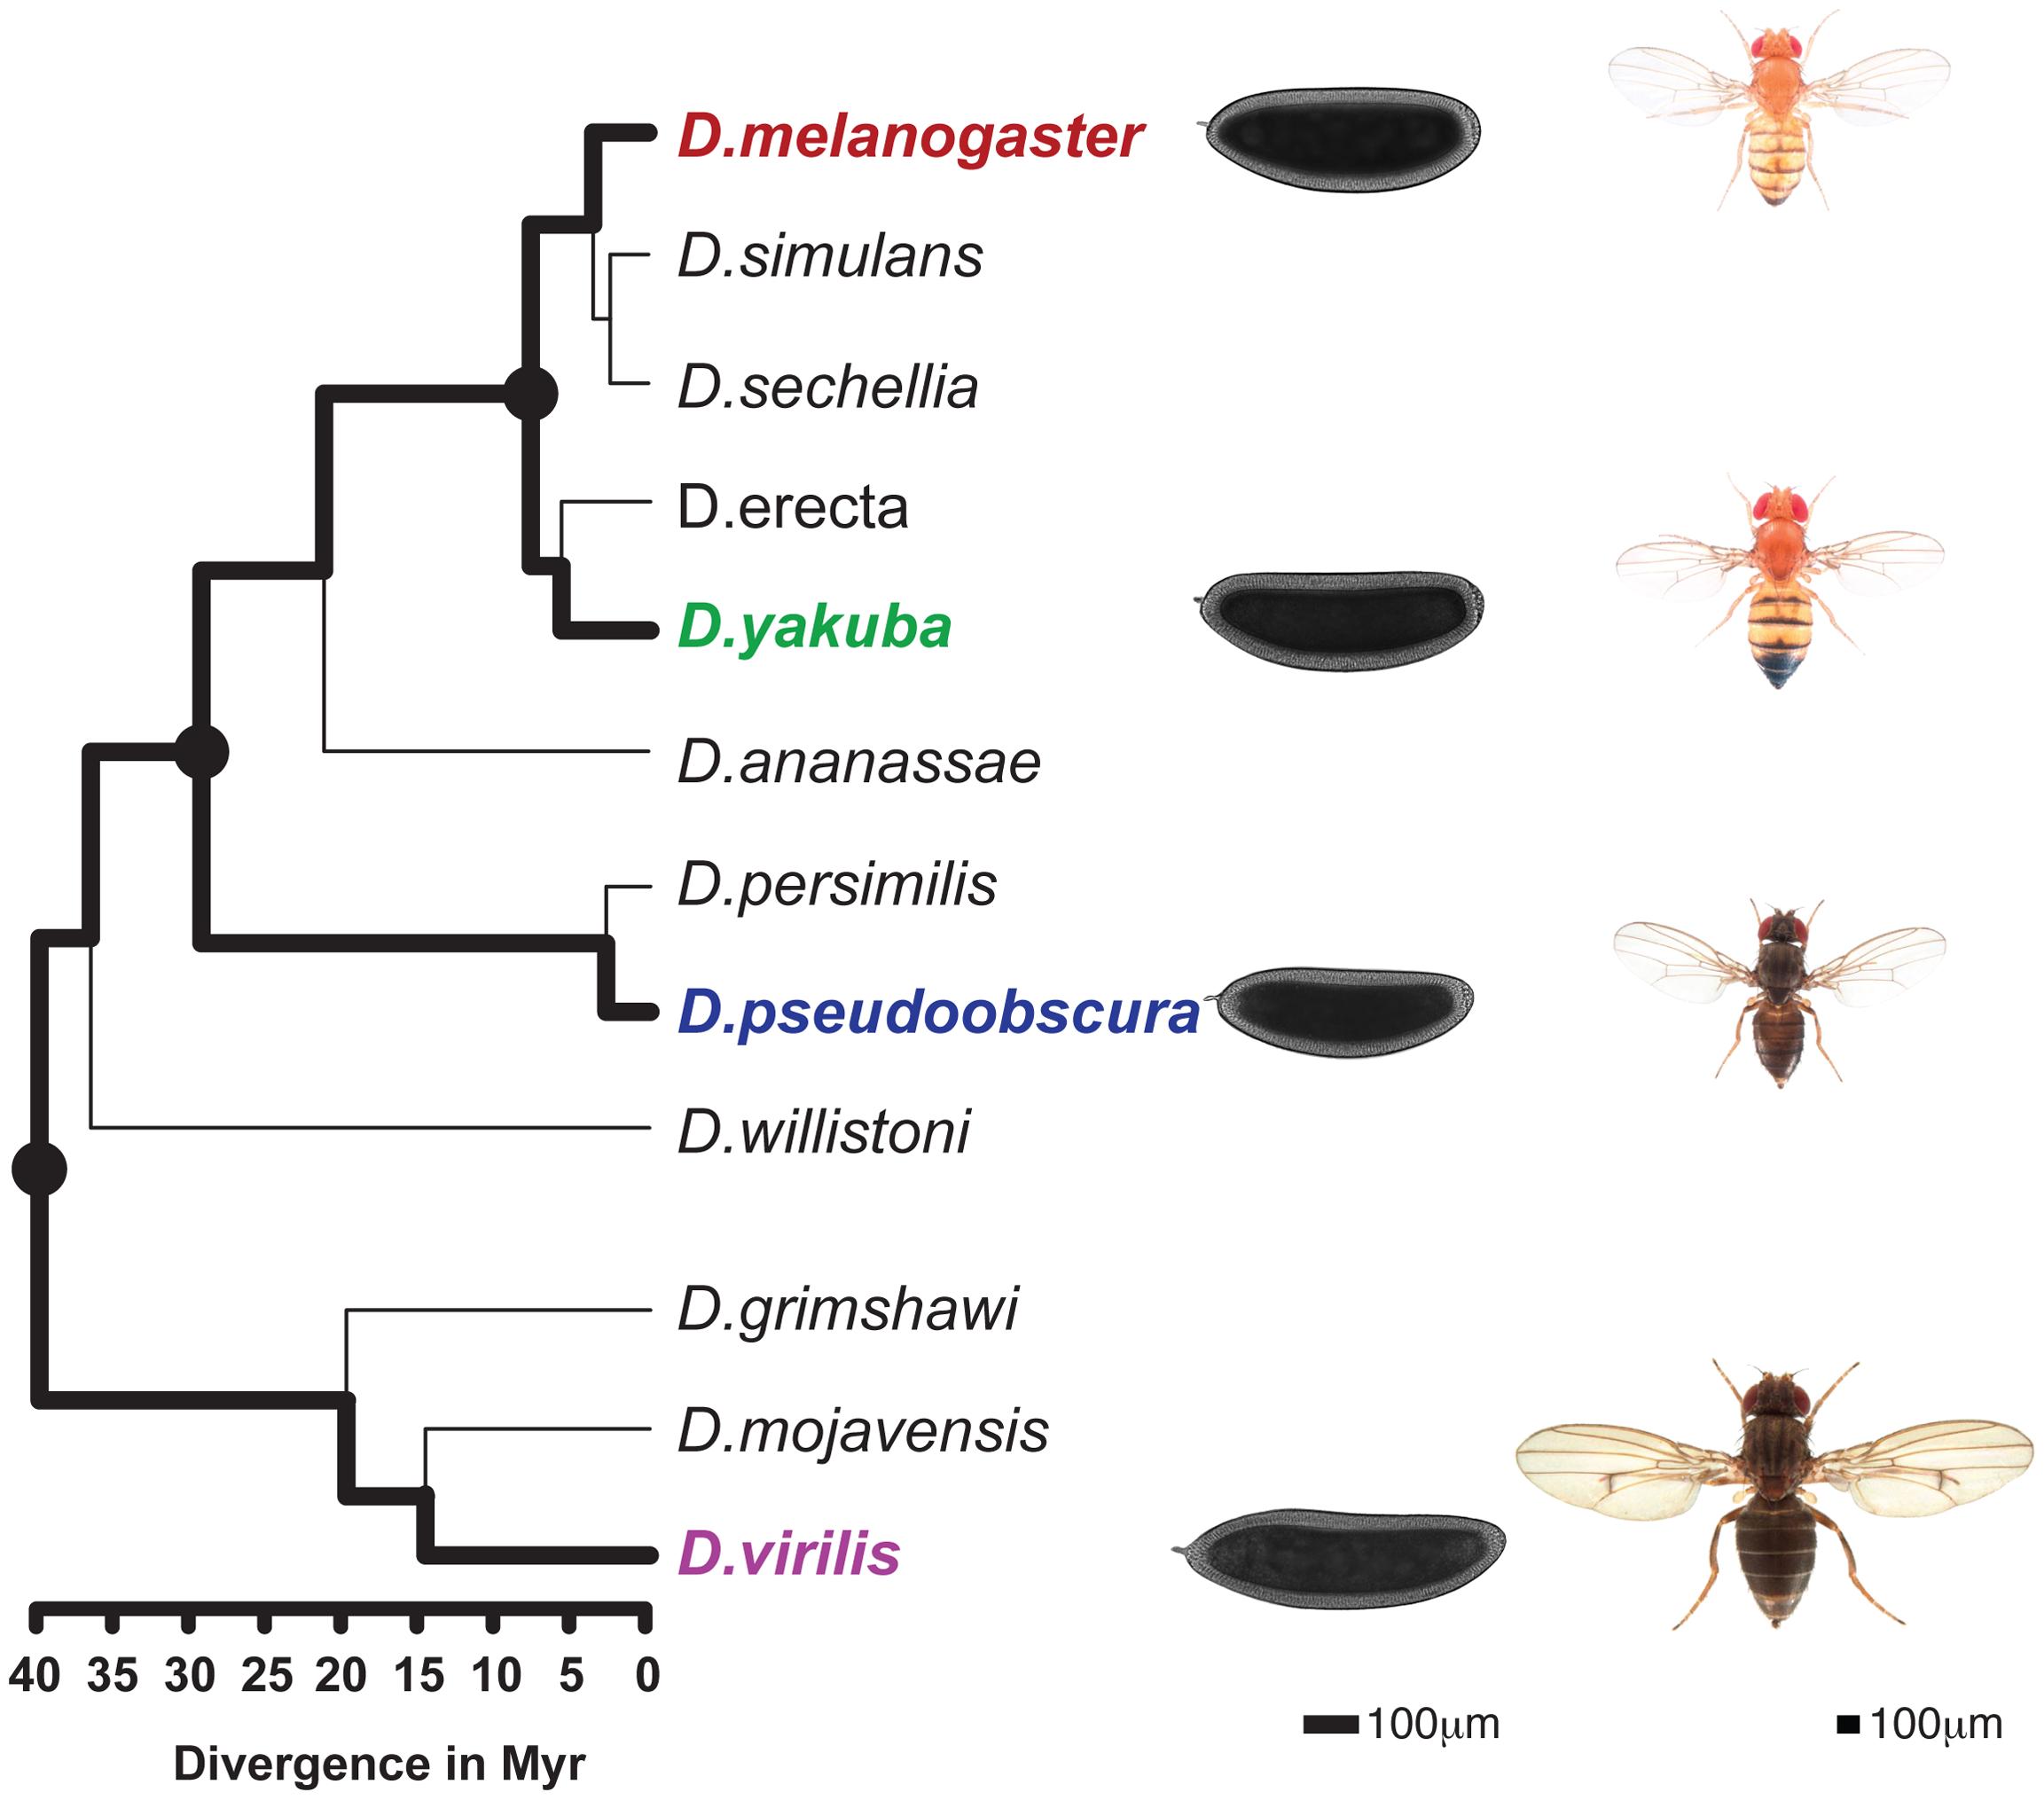 Phylogenetic tree of the <i>Drosophila</i> genus.